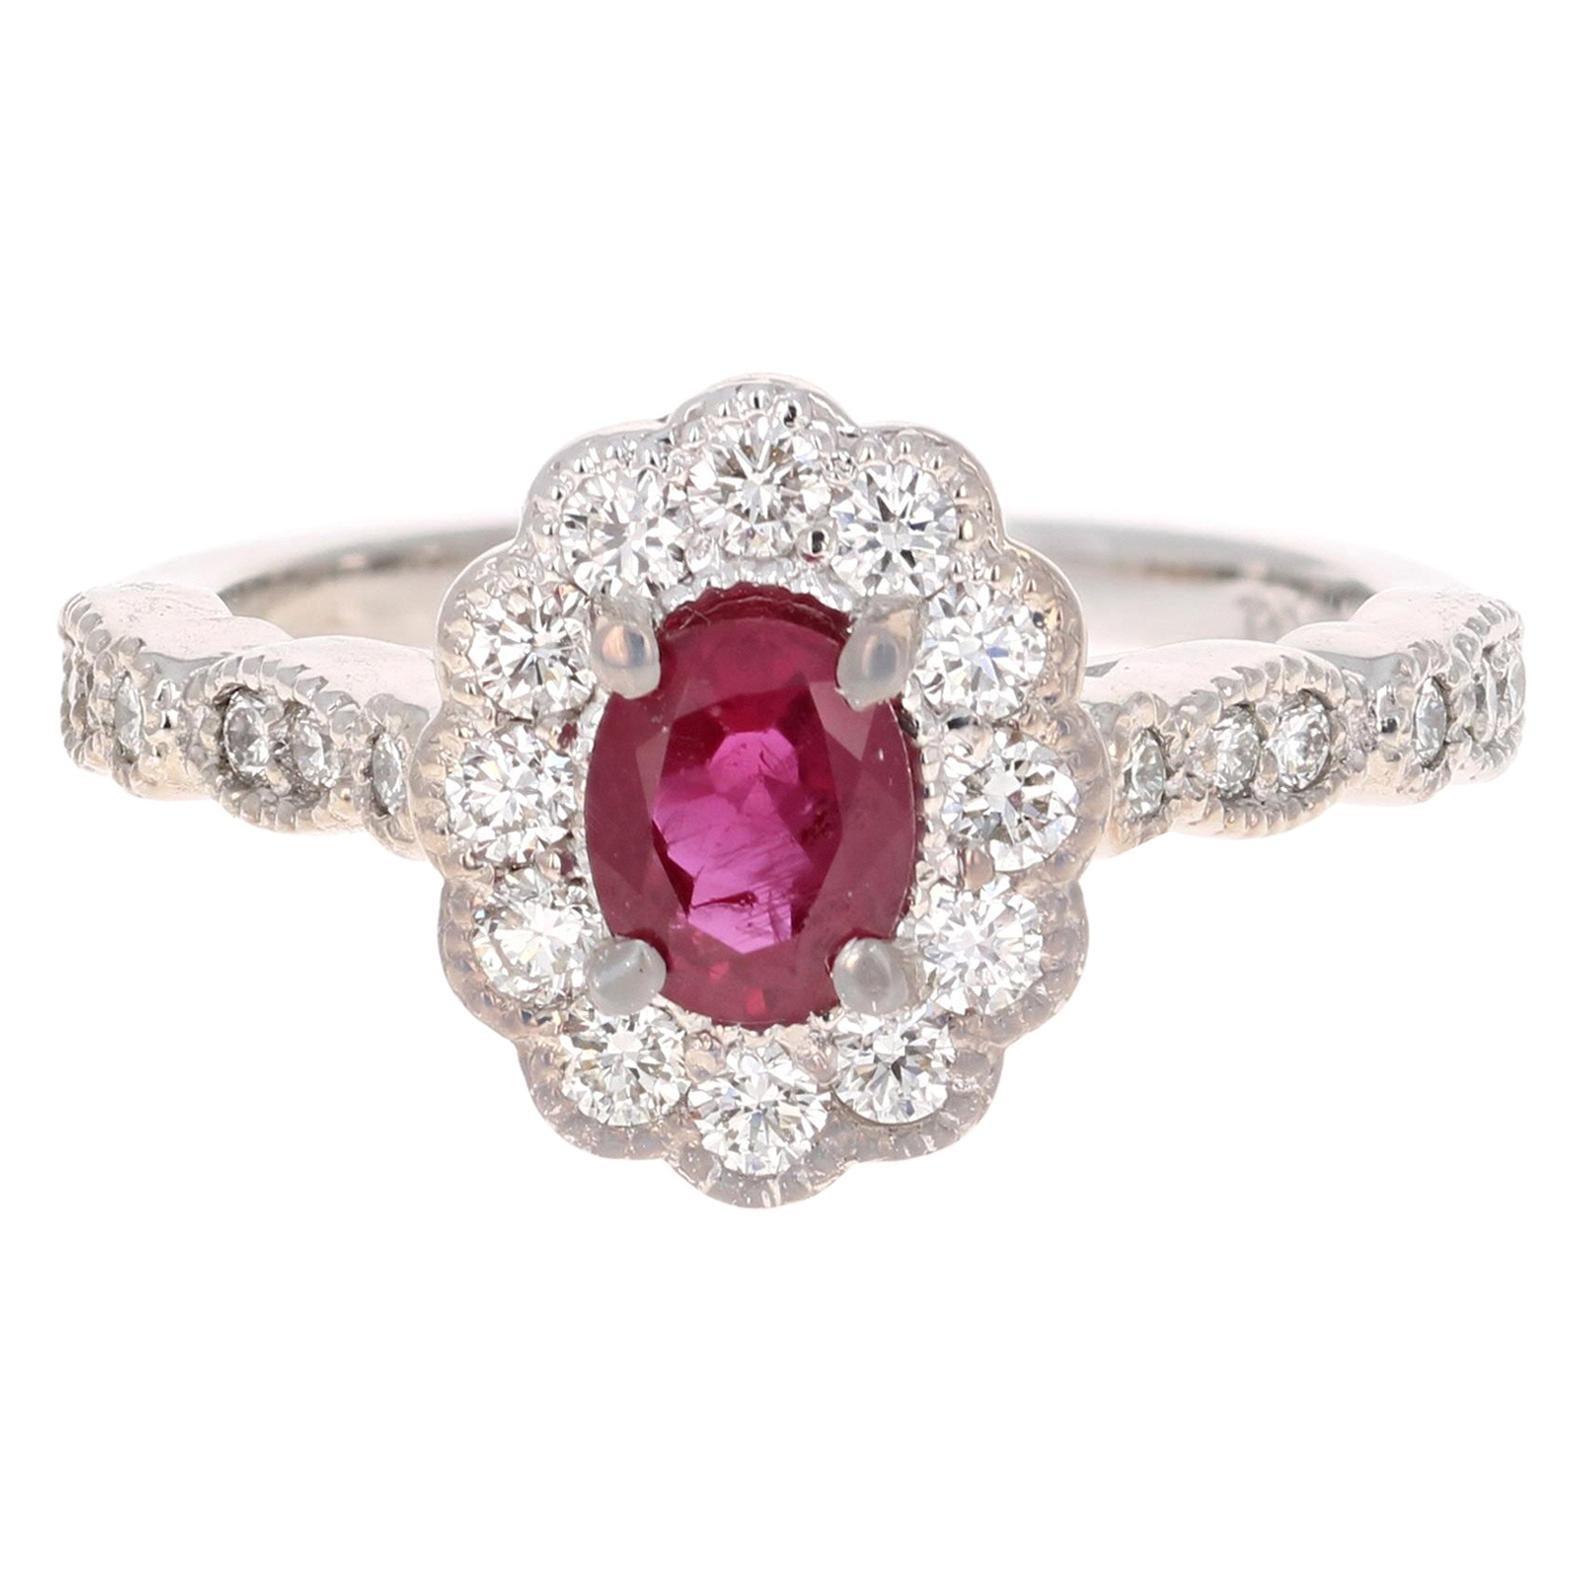 1.65 Carat Oval Cut Burmese Ruby Diamond 14 Karat White Gold Bridal Ring